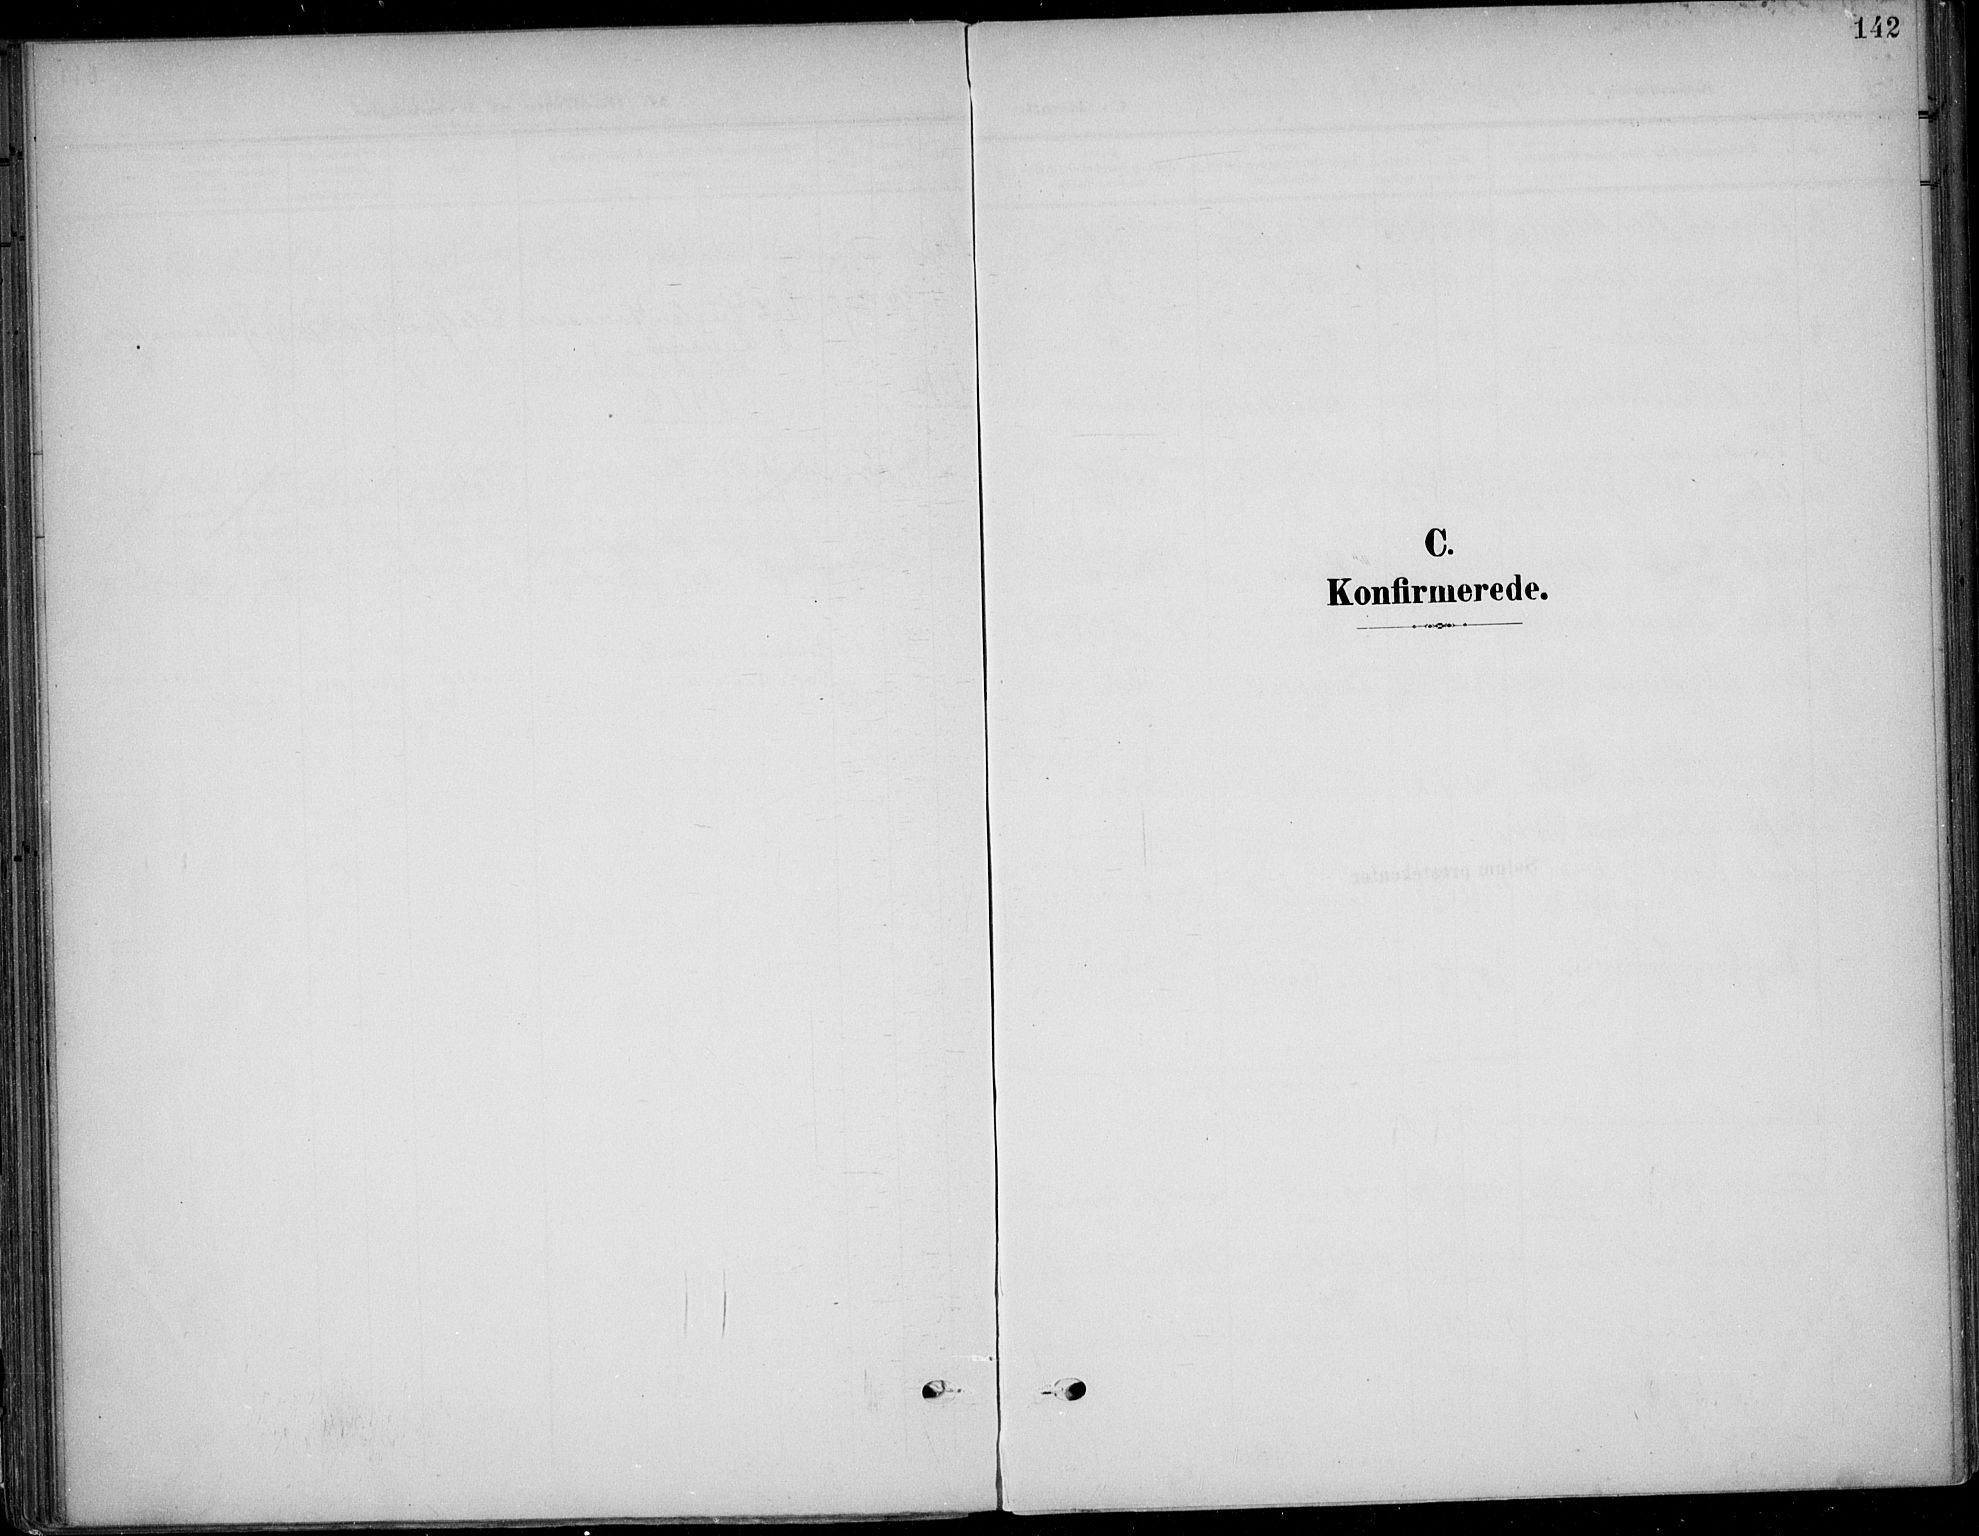 SAKO, Solum kirkebøker, F/Fb/L0003: Ministerialbok nr. II 3, 1901-1912, s. 142